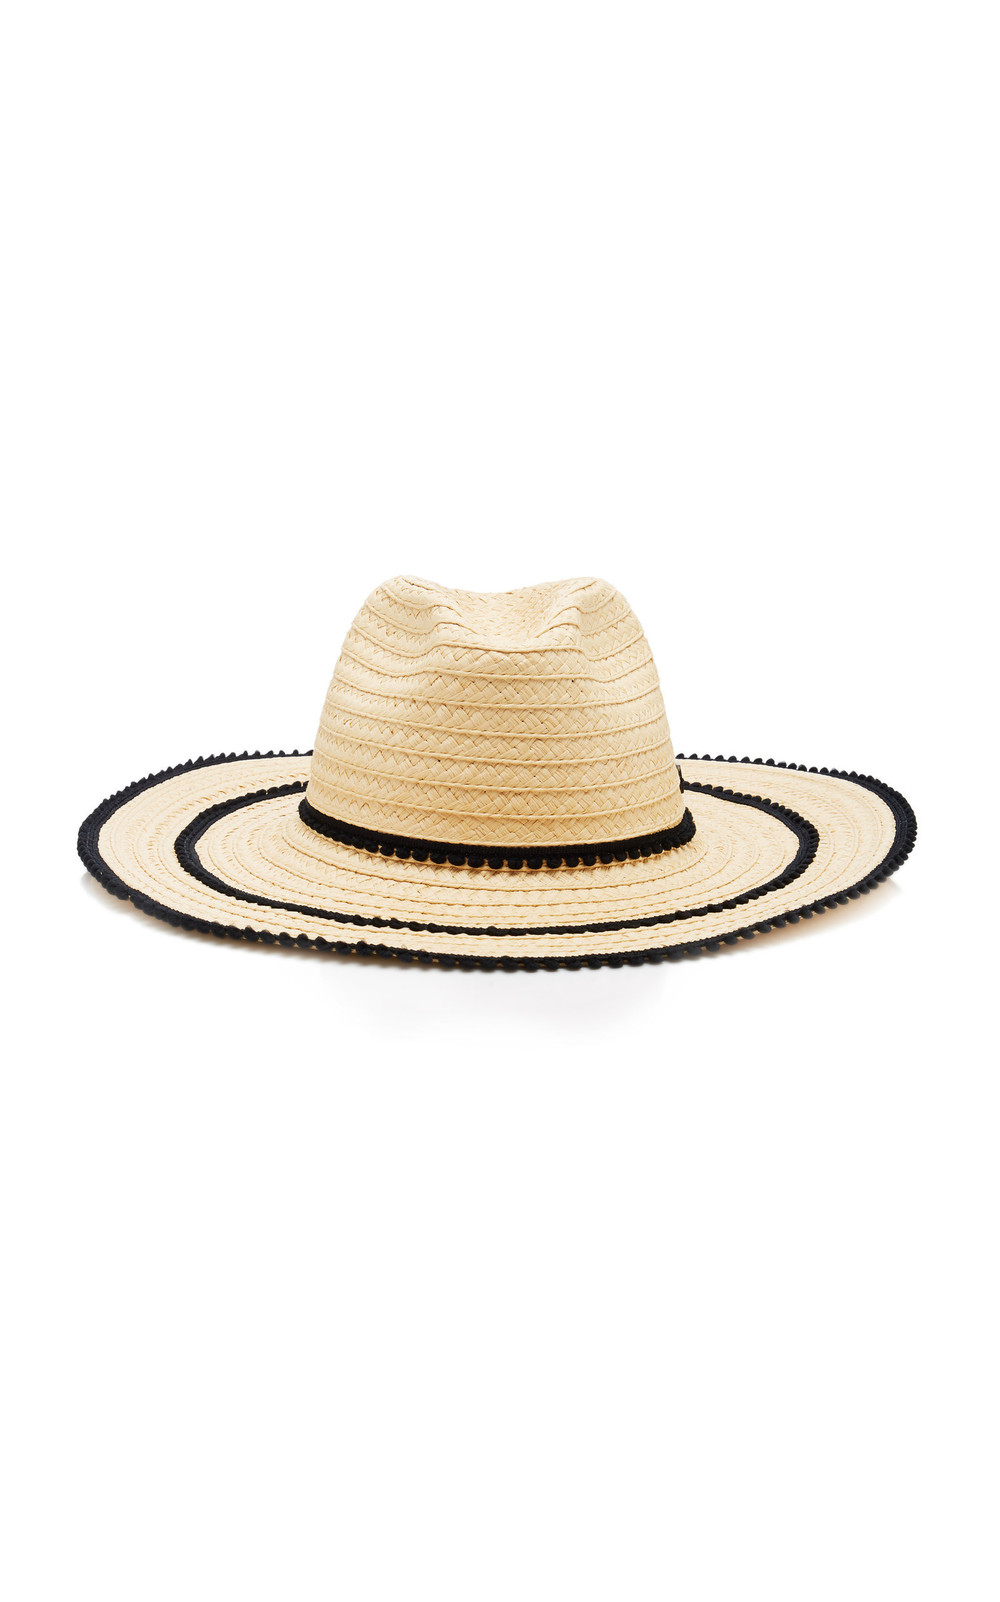 Filu Hats Batu Tara Picot-Trimmed Straw Hat in neutral